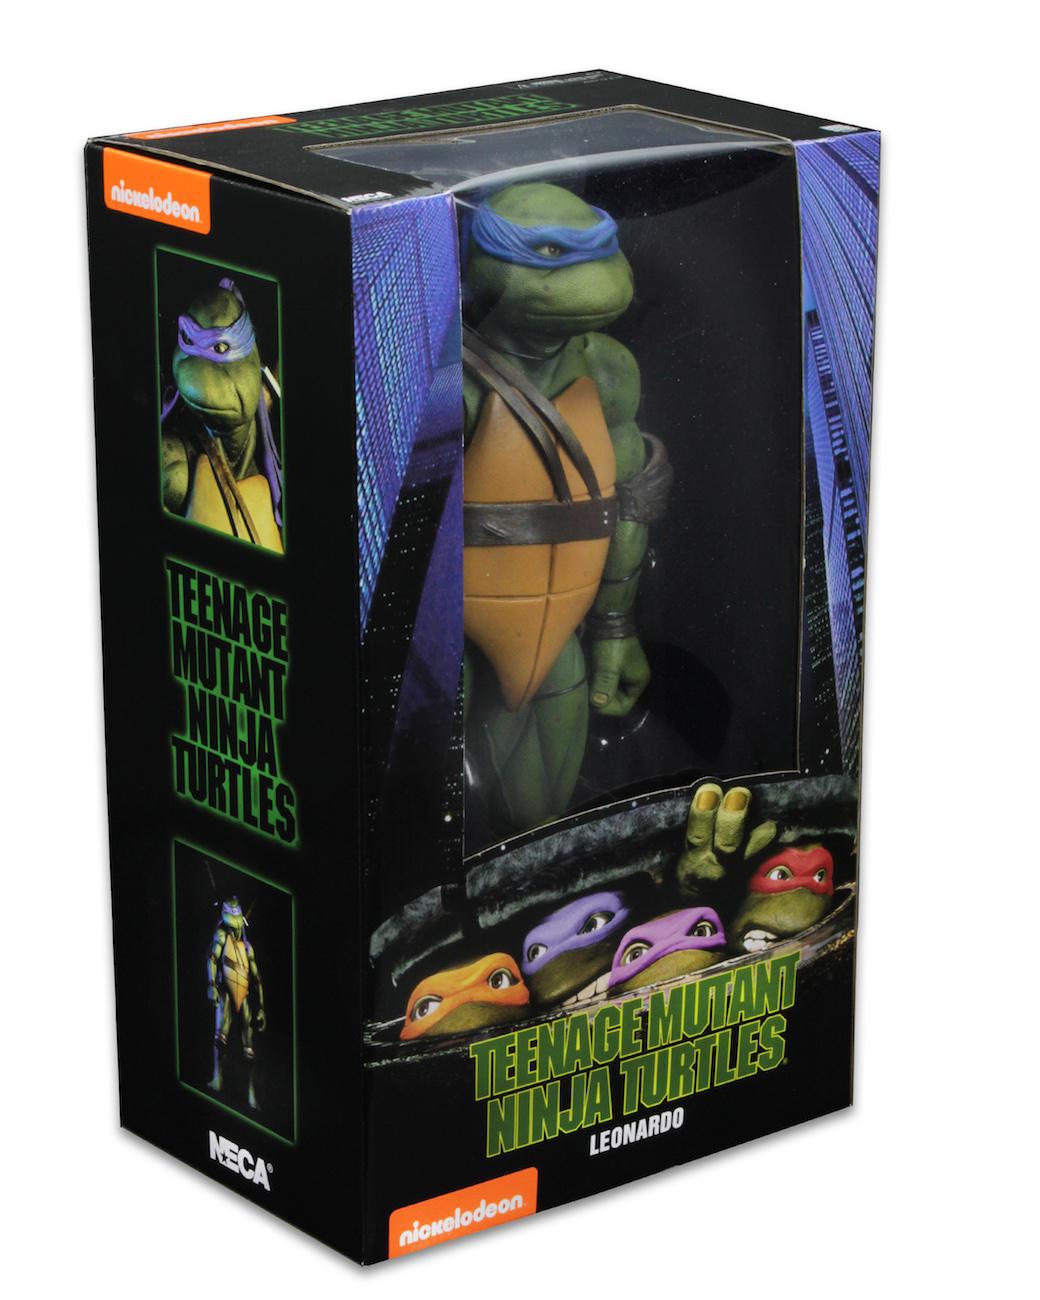 NECA-TMNT-1990-box-06.jpg